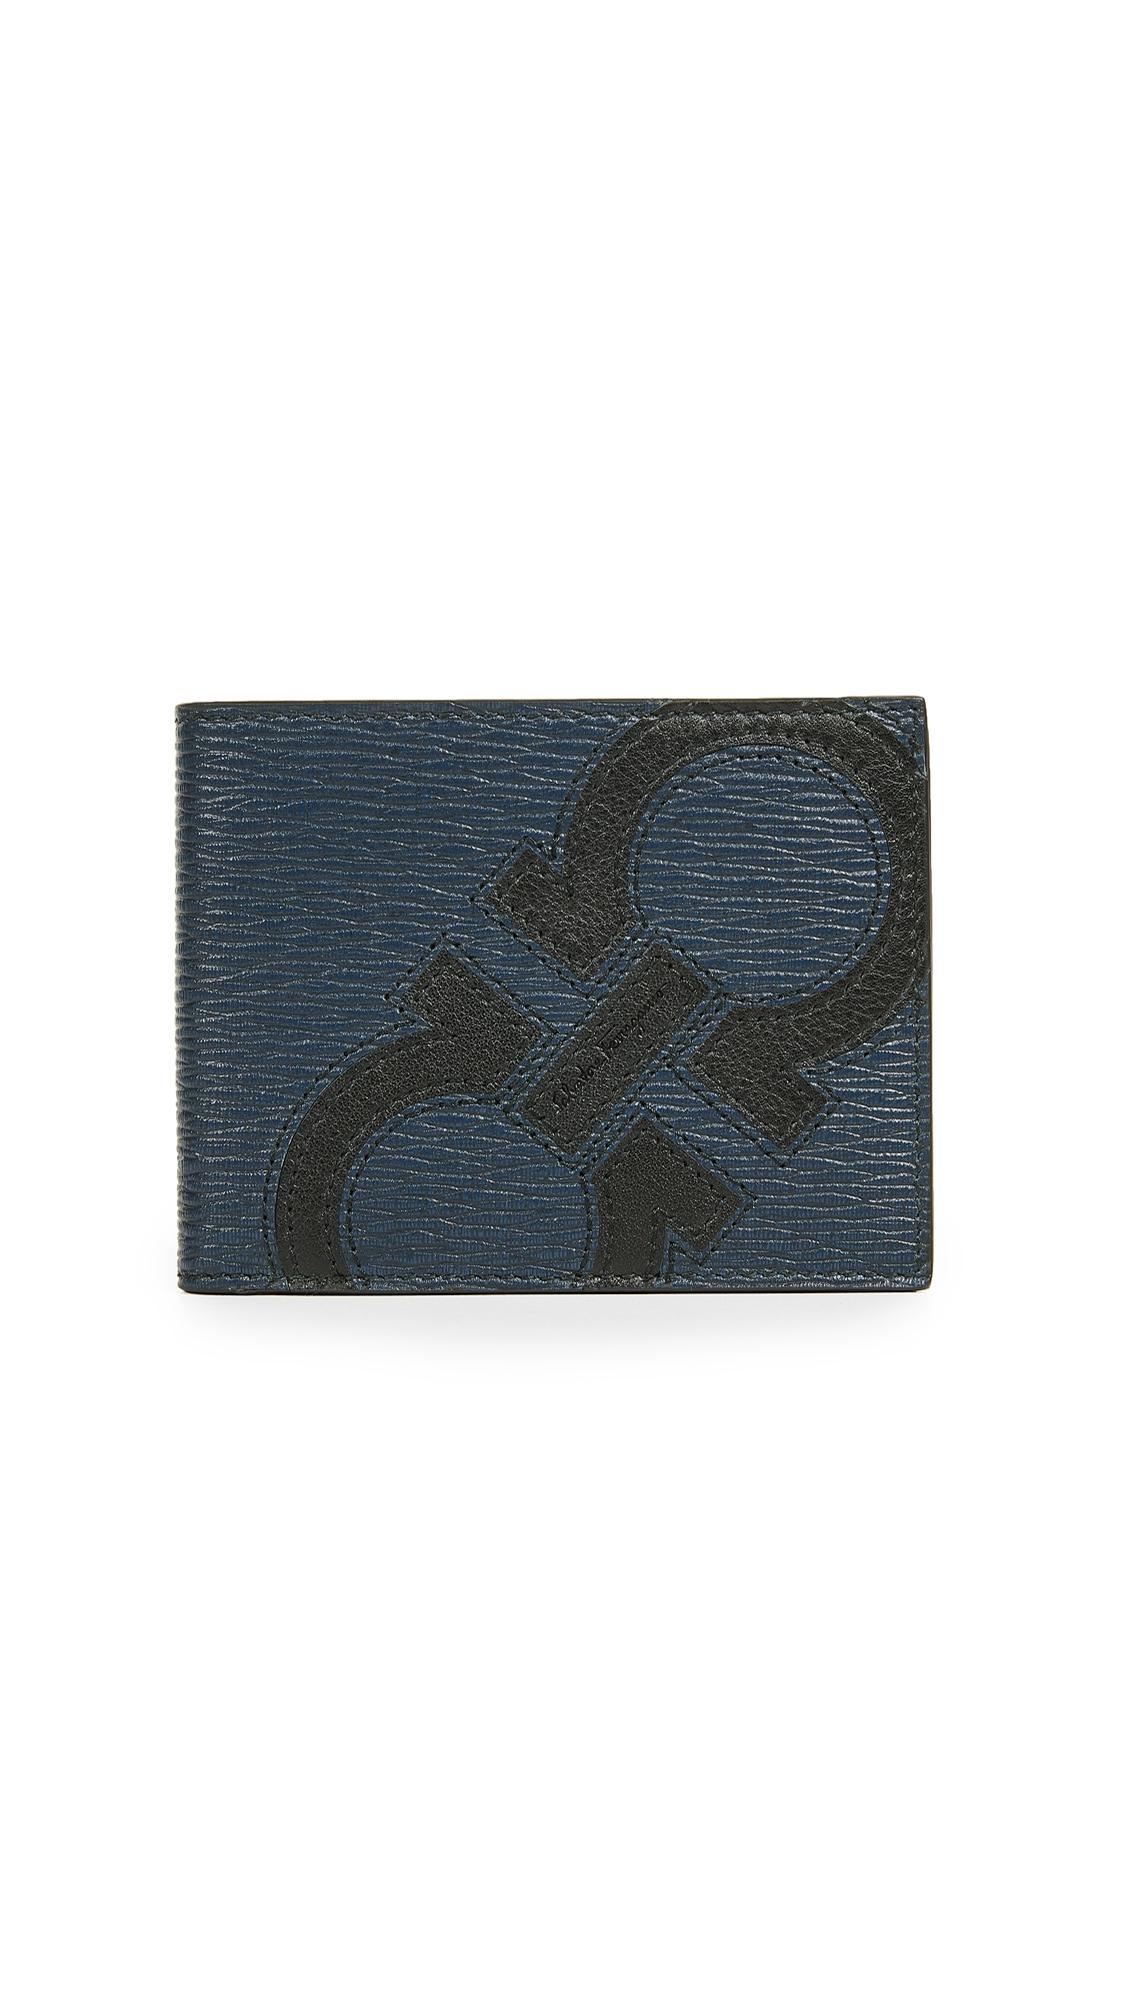 Salvatore Ferragamo Revival Maxy Billfold Wallet In Blue/Black